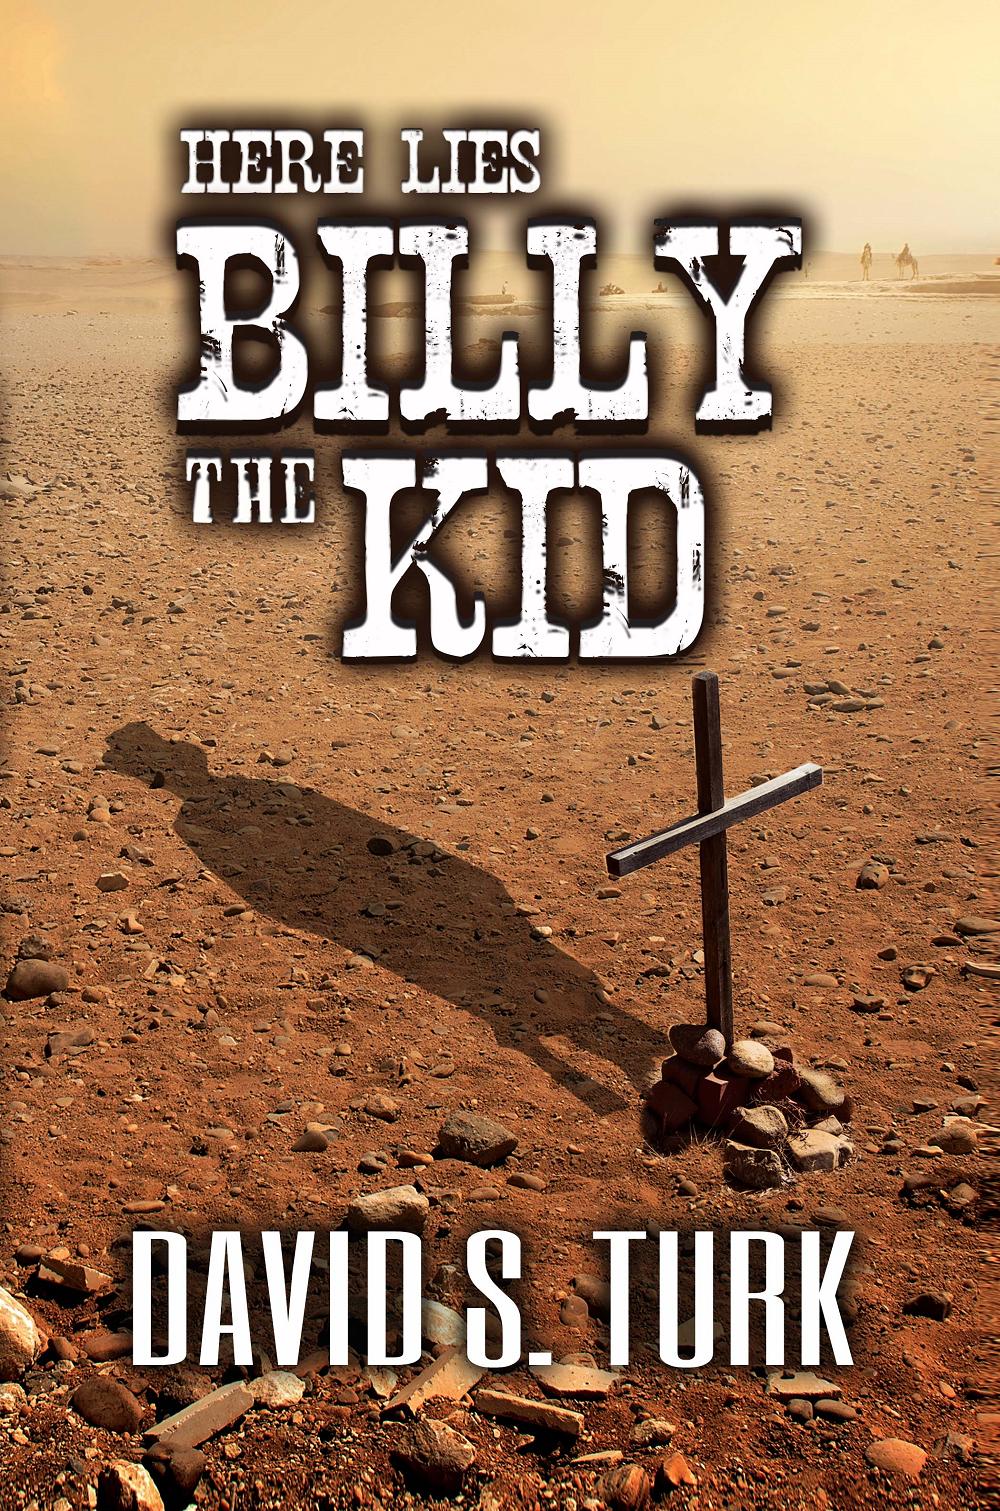 Here Lies Billy the Kid David S. Turk